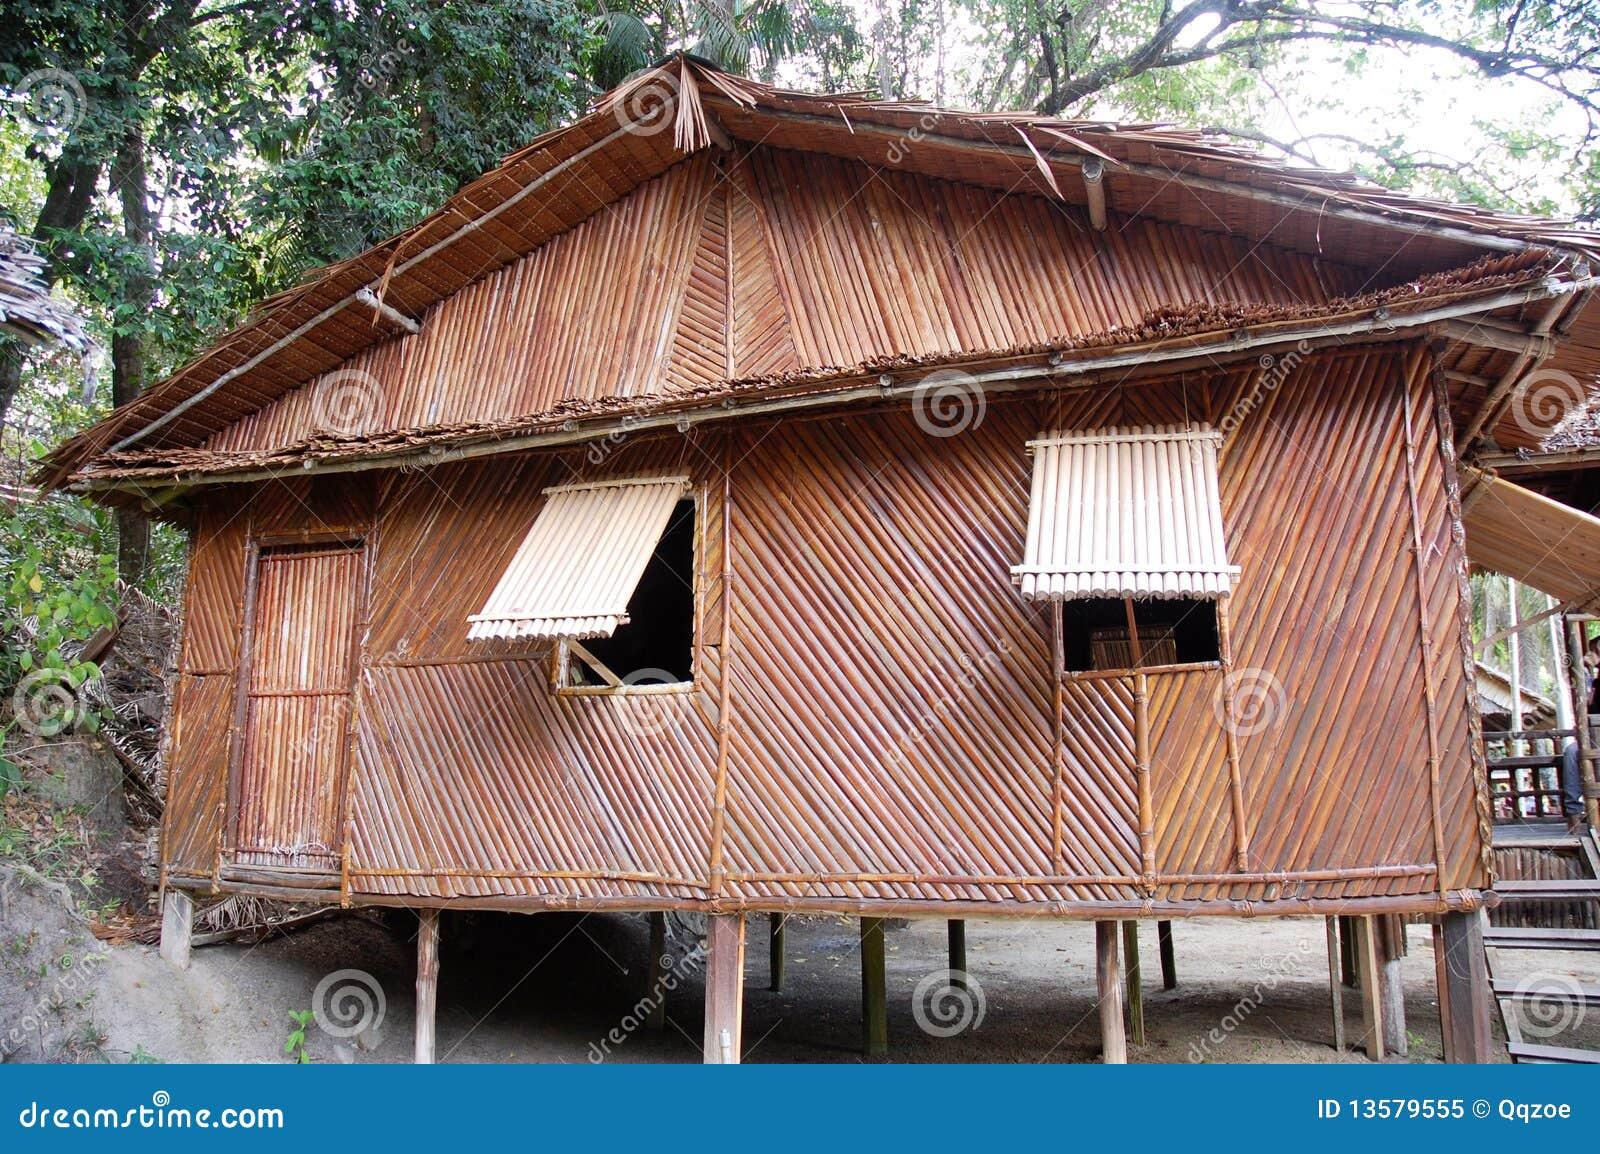 maison en bambou image stock image du tropiques nature. Black Bedroom Furniture Sets. Home Design Ideas